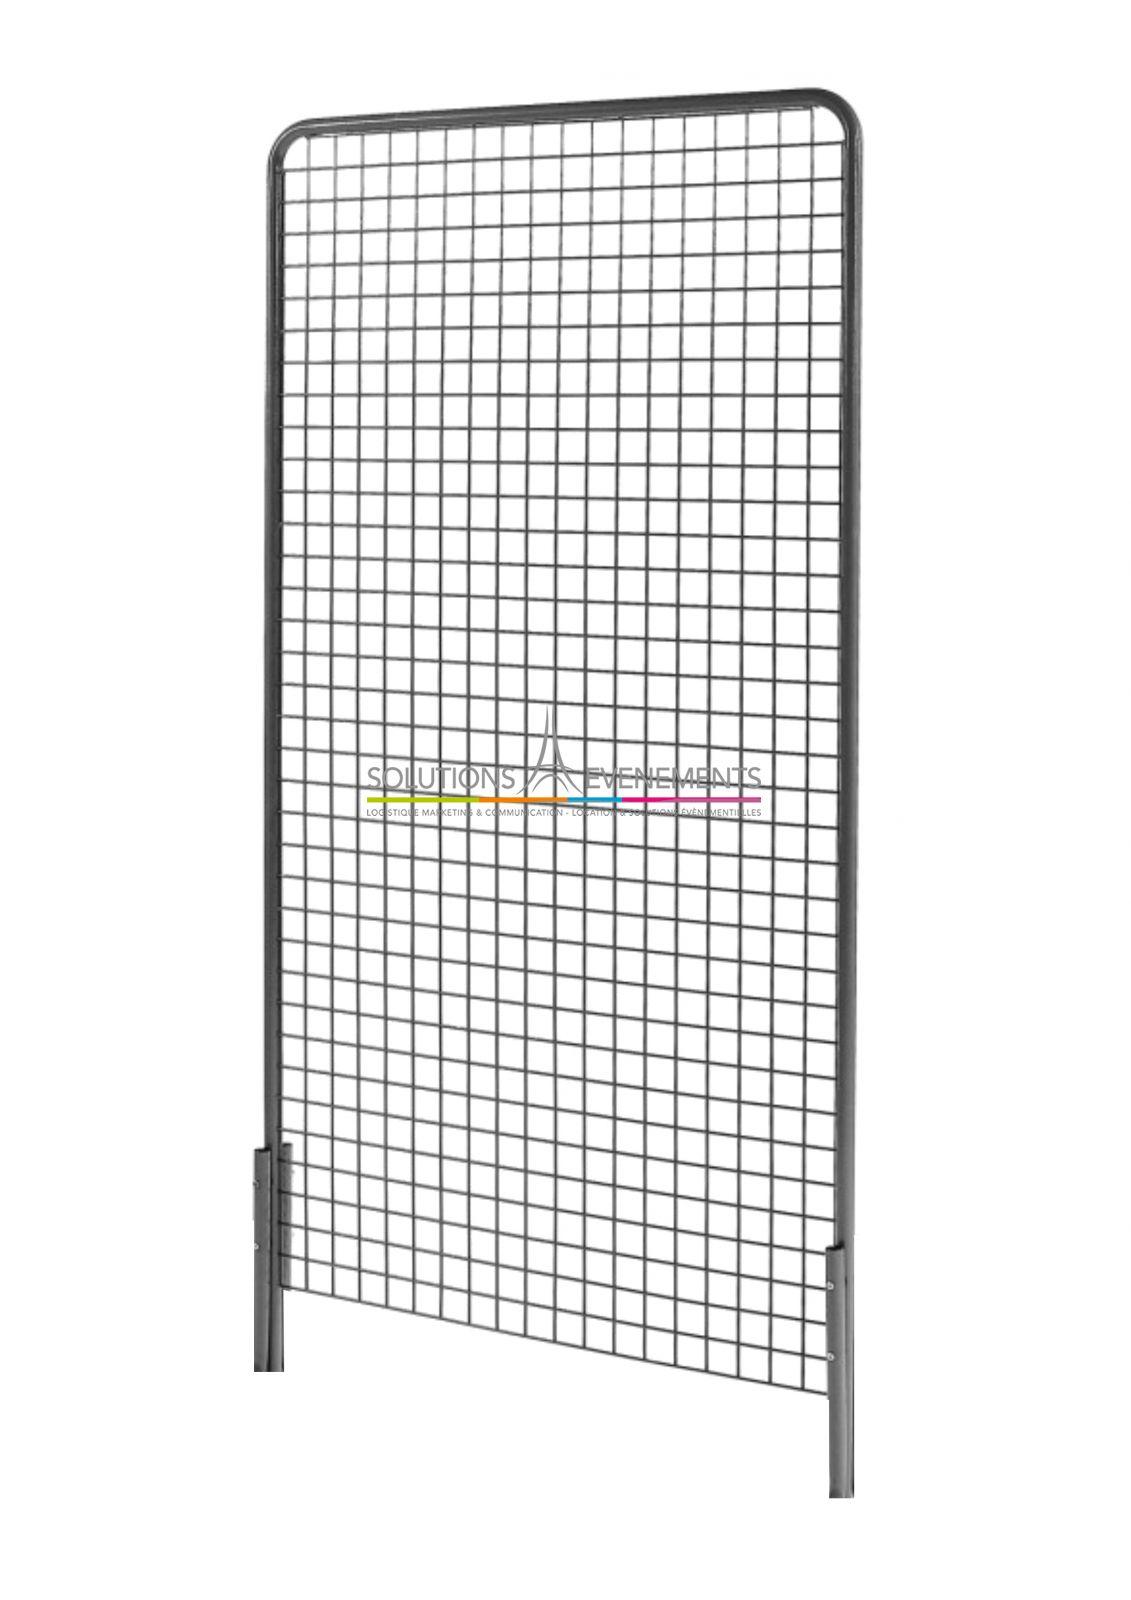 location grille d 39 exposition caddie affichage. Black Bedroom Furniture Sets. Home Design Ideas